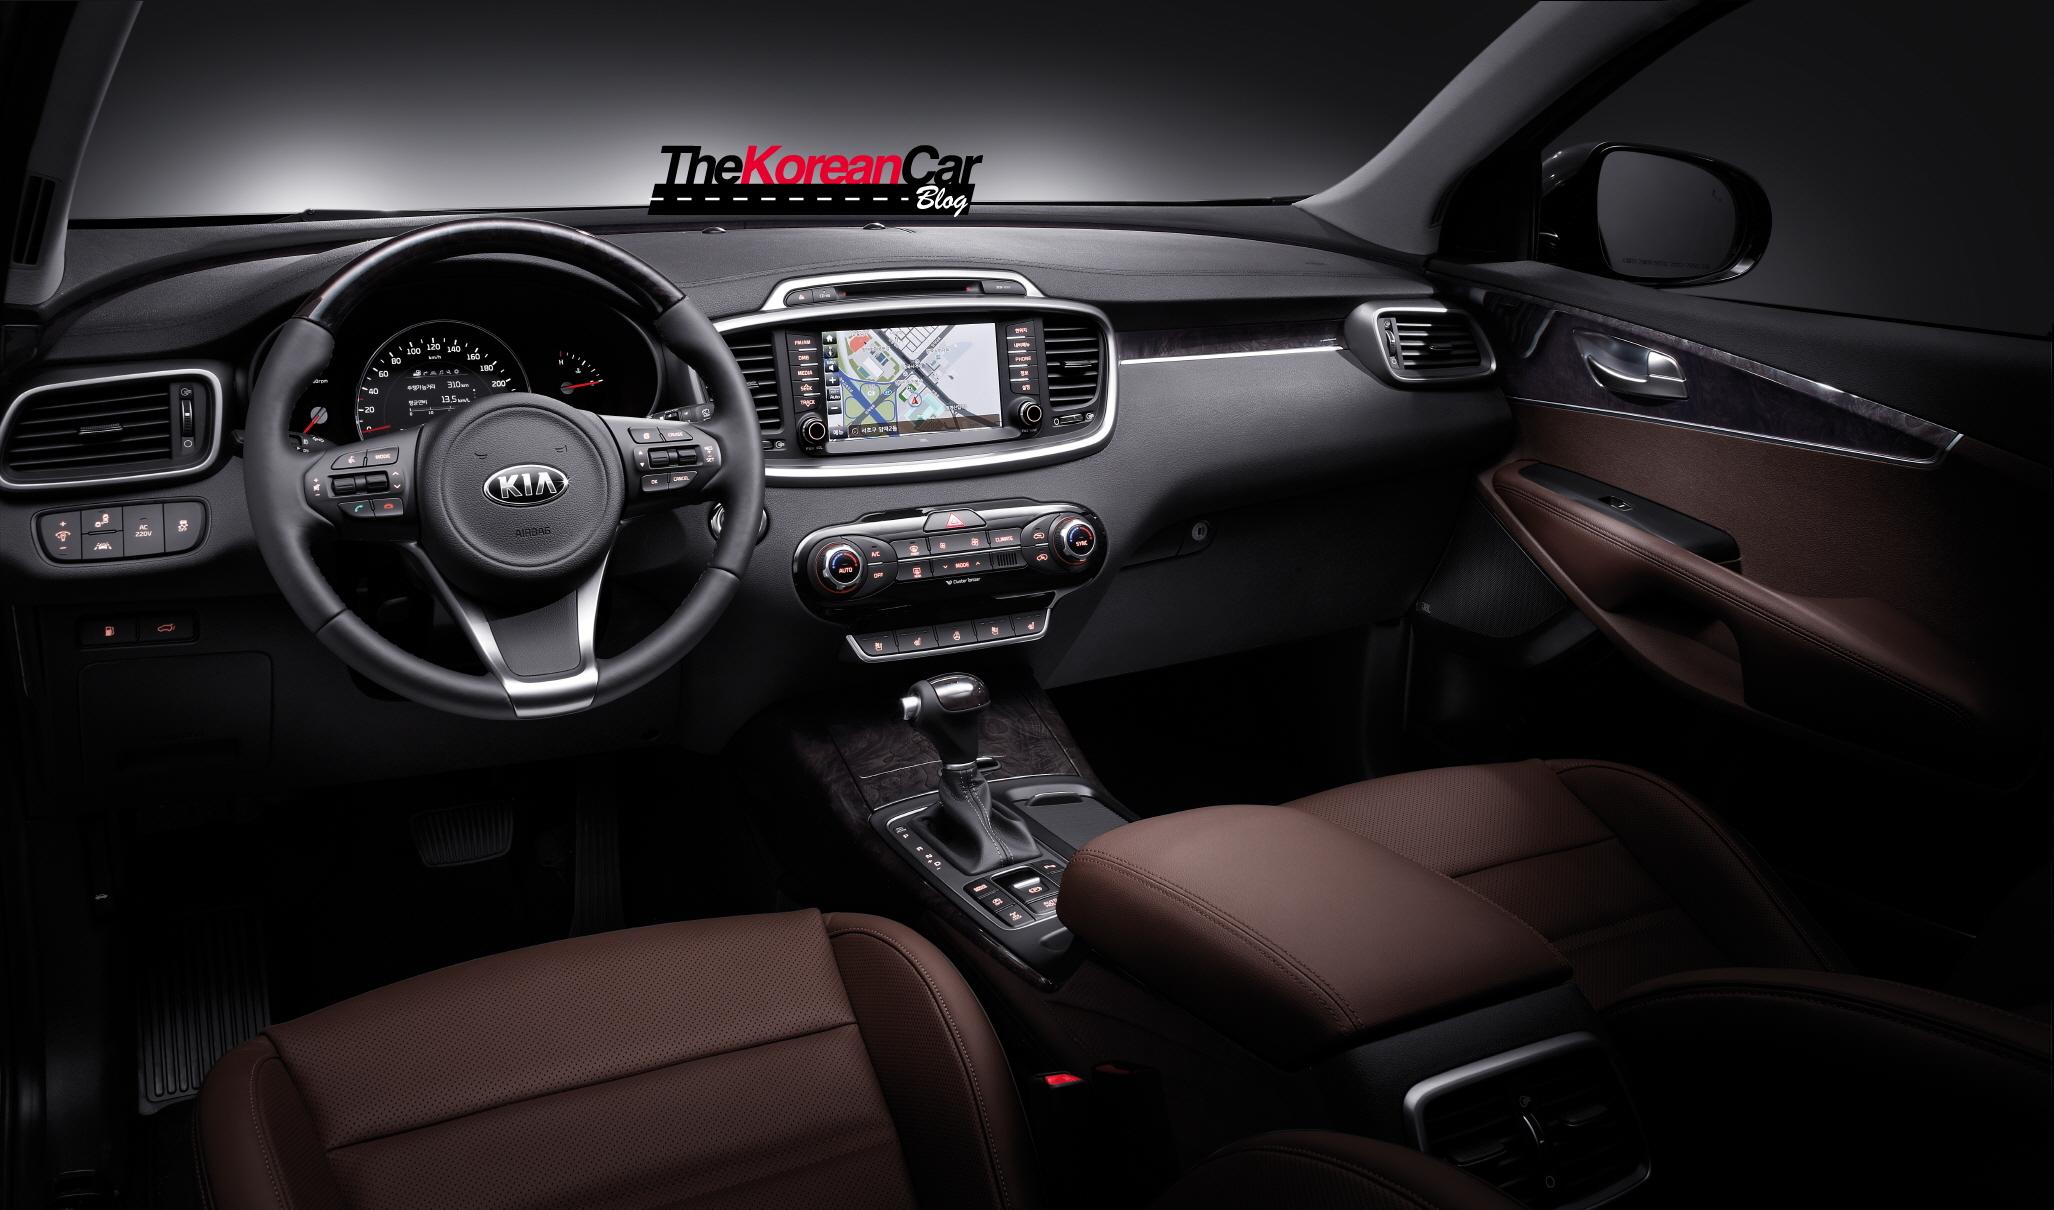 Exclusive: All-New Kia Sorento Interior Pictures Revealed